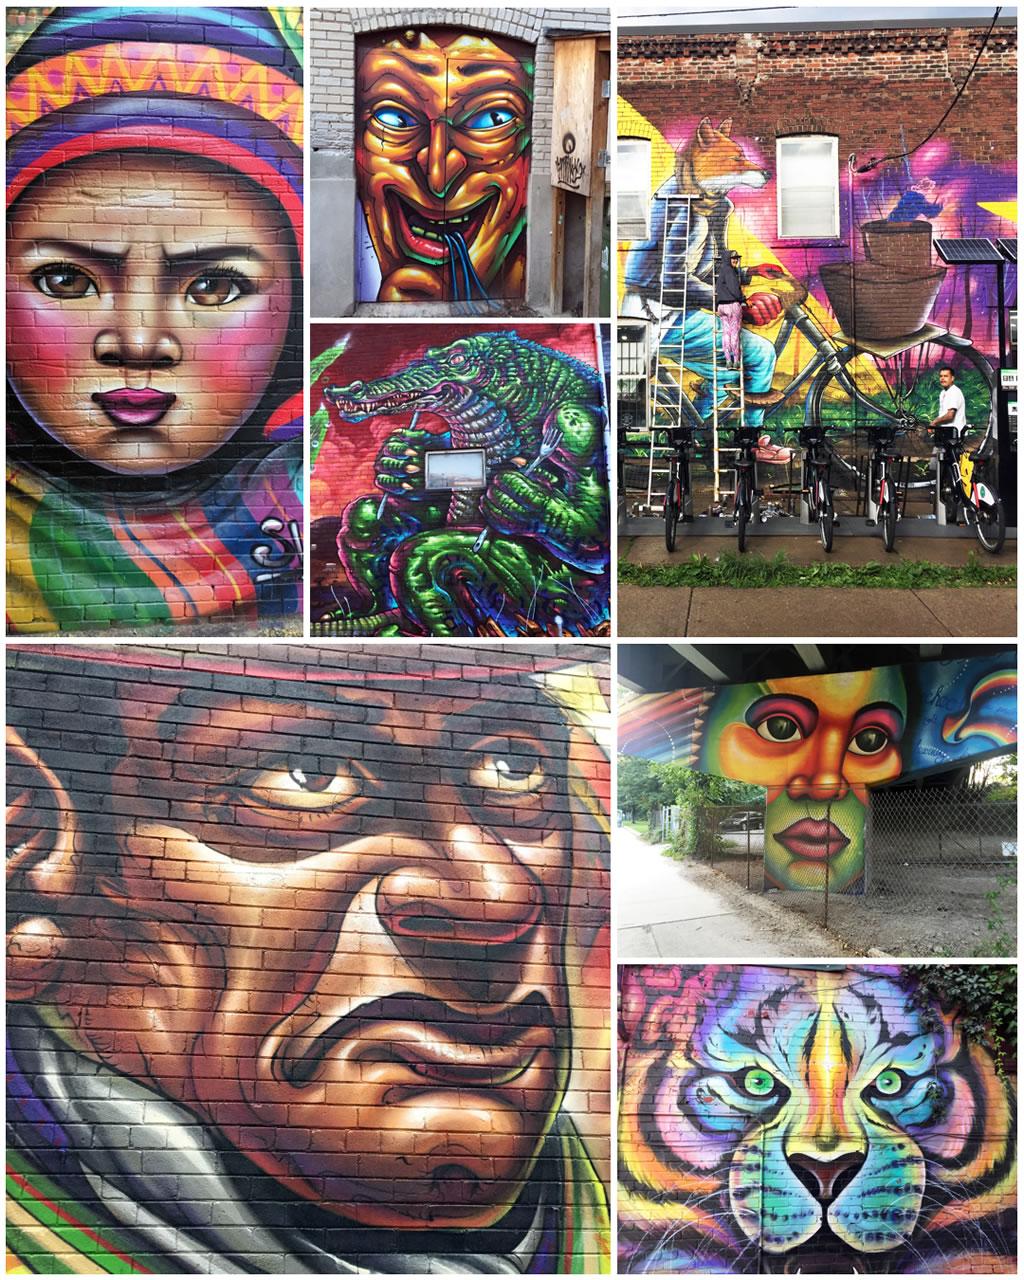 Bruno Smoky & Shalak Attack Toronto Street Art Graffiti